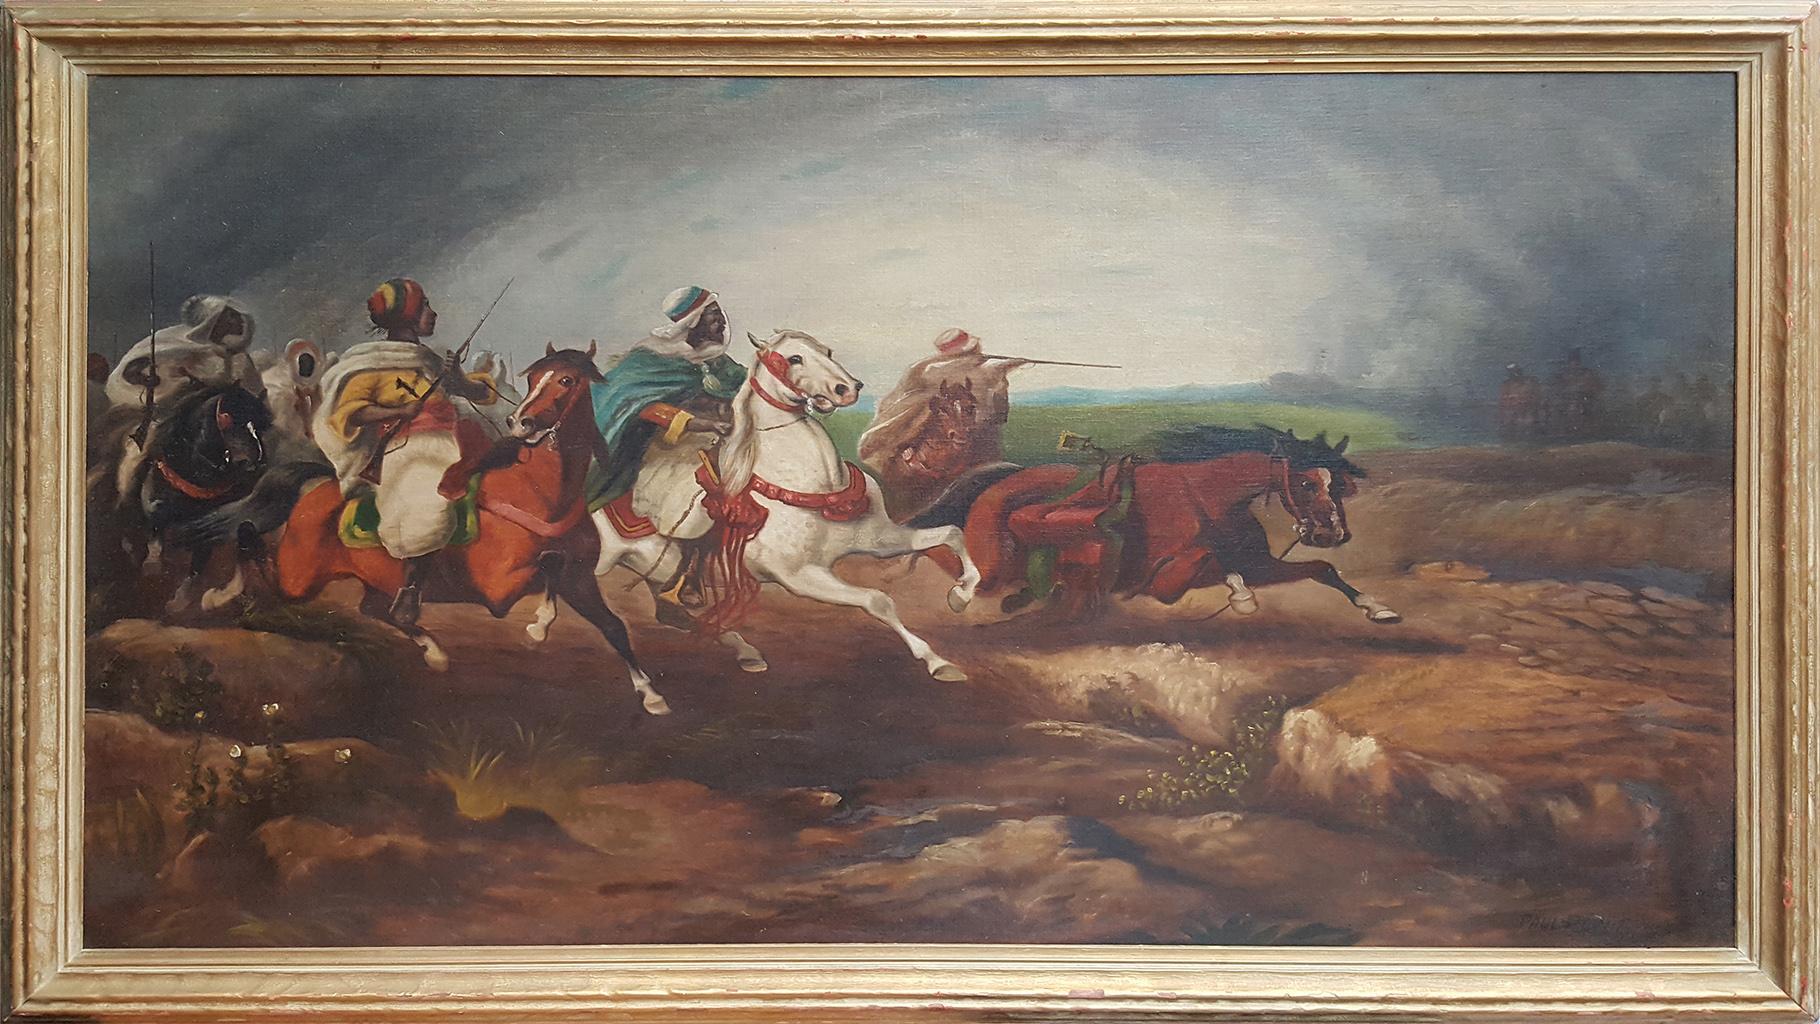 horsemen-in-battle.jpg